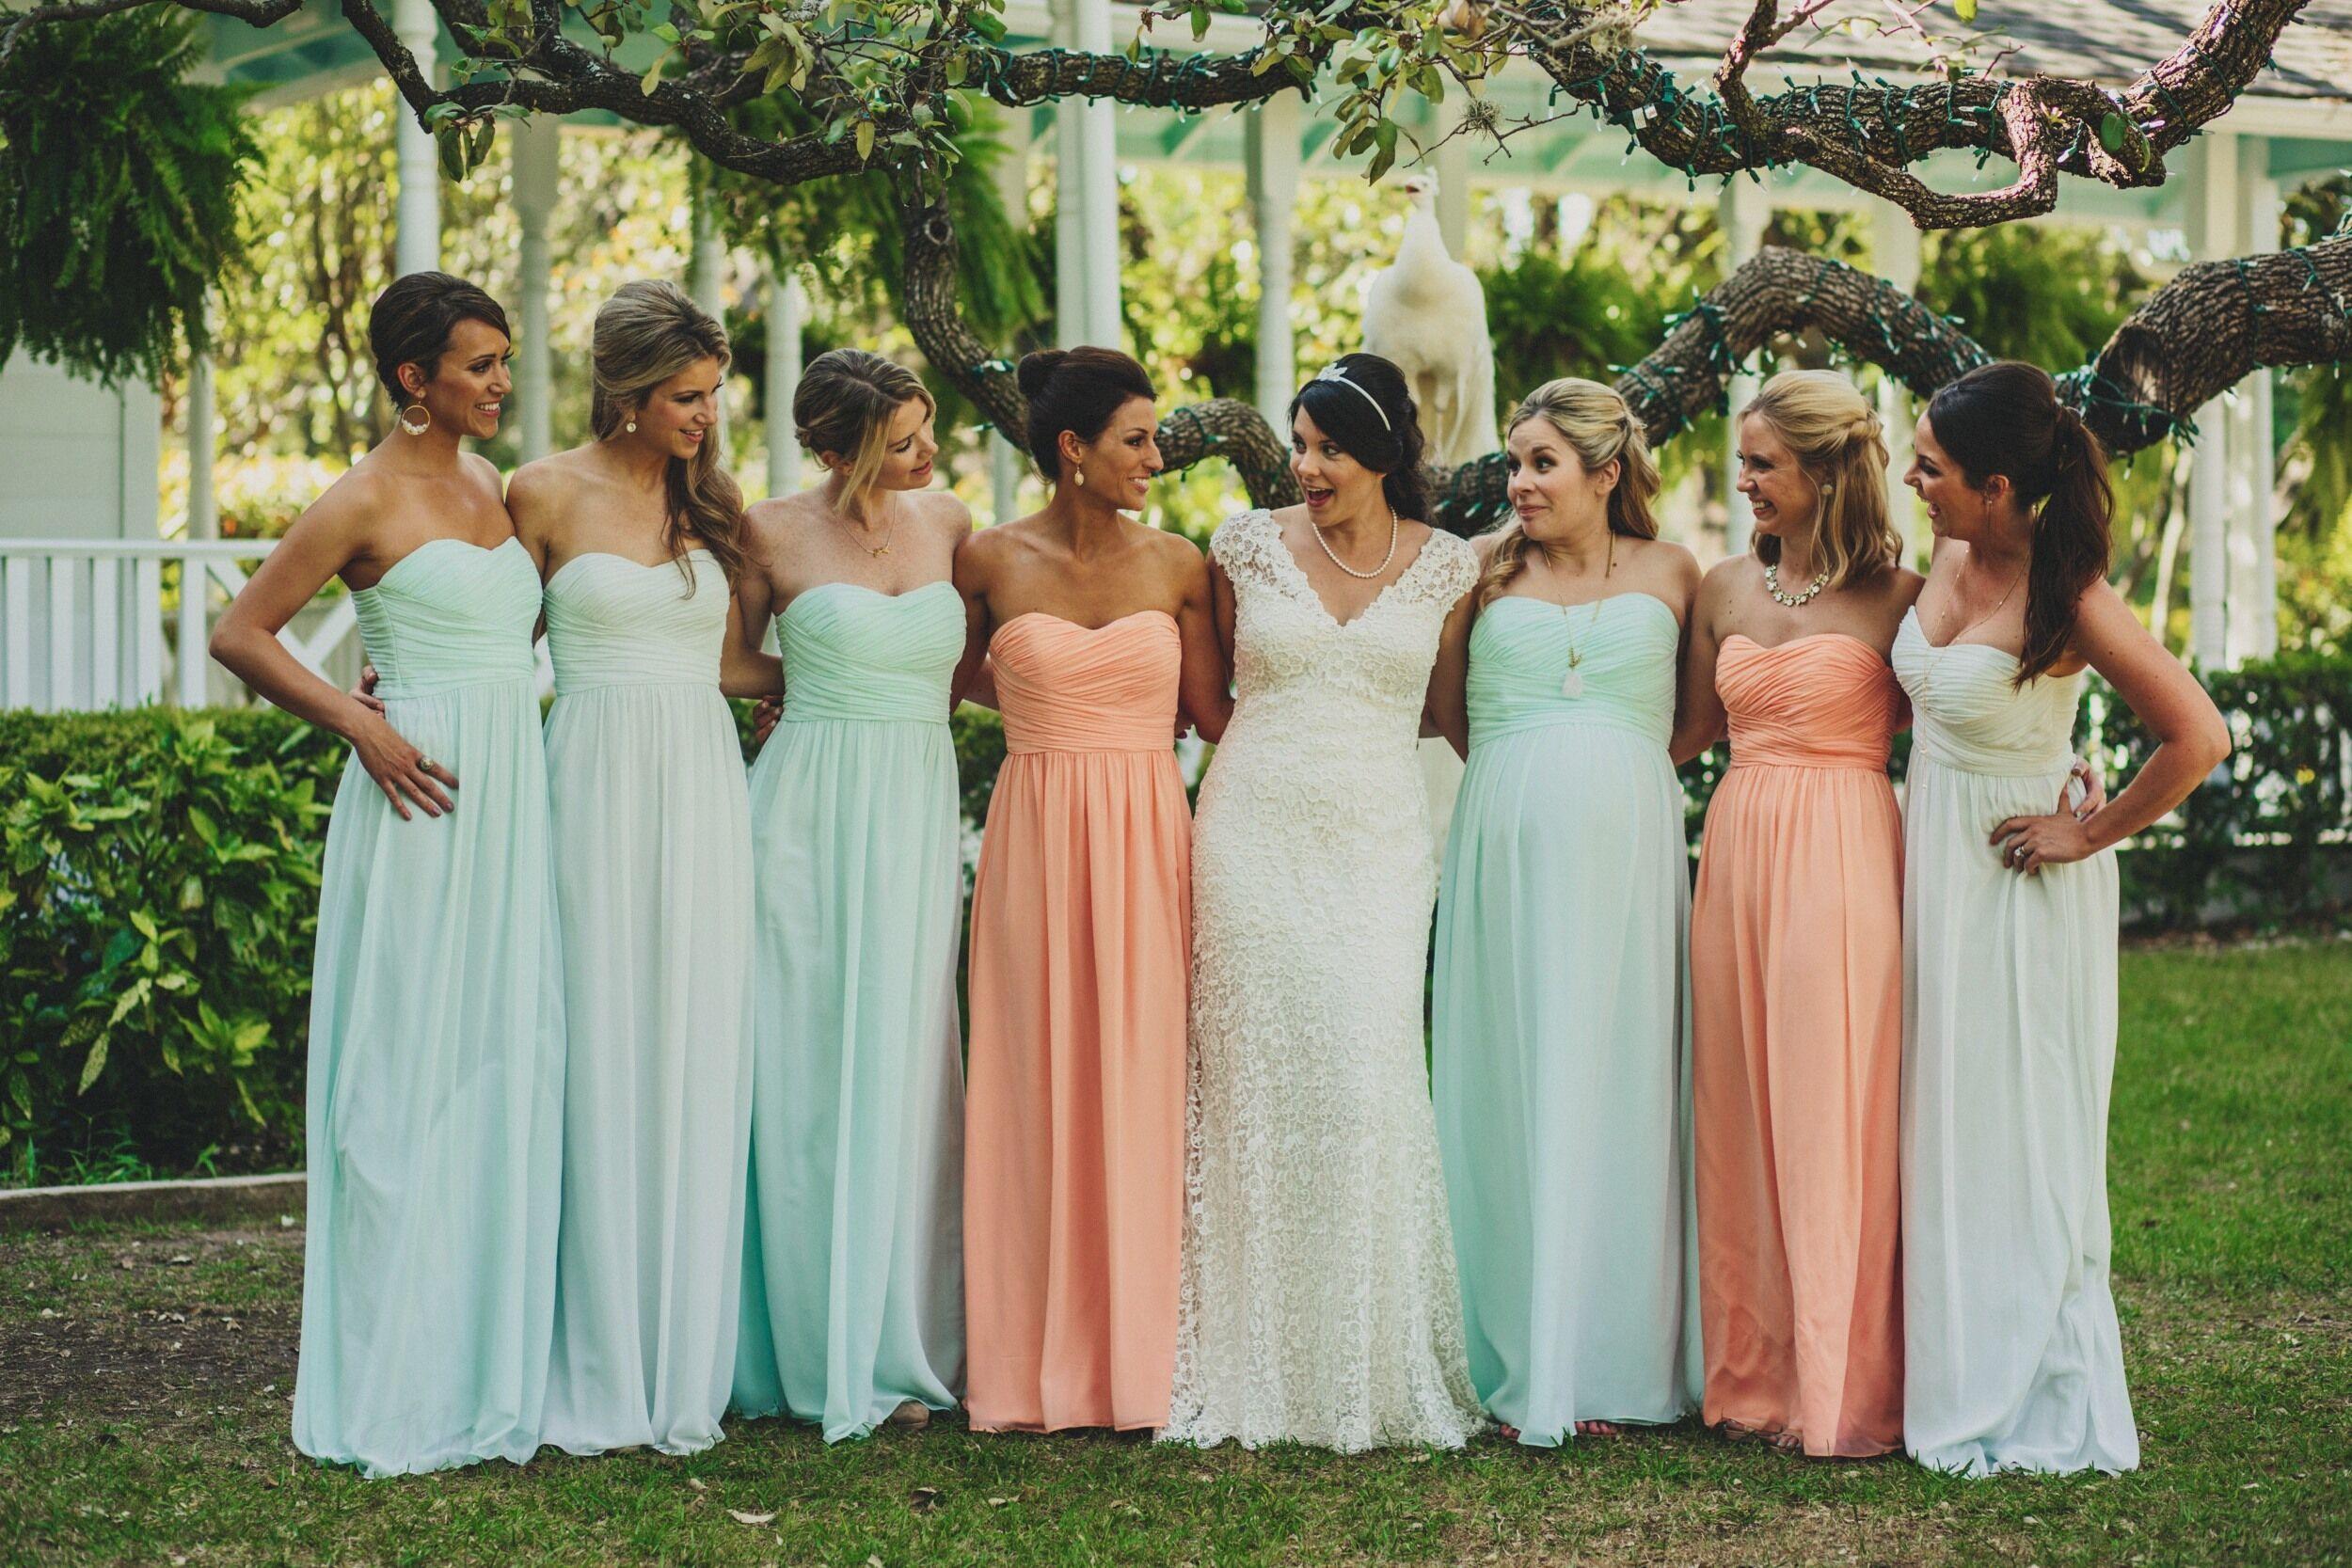 Peach and mint chiffon bridesmaids dresses for Mint bridesmaid dresses wedding